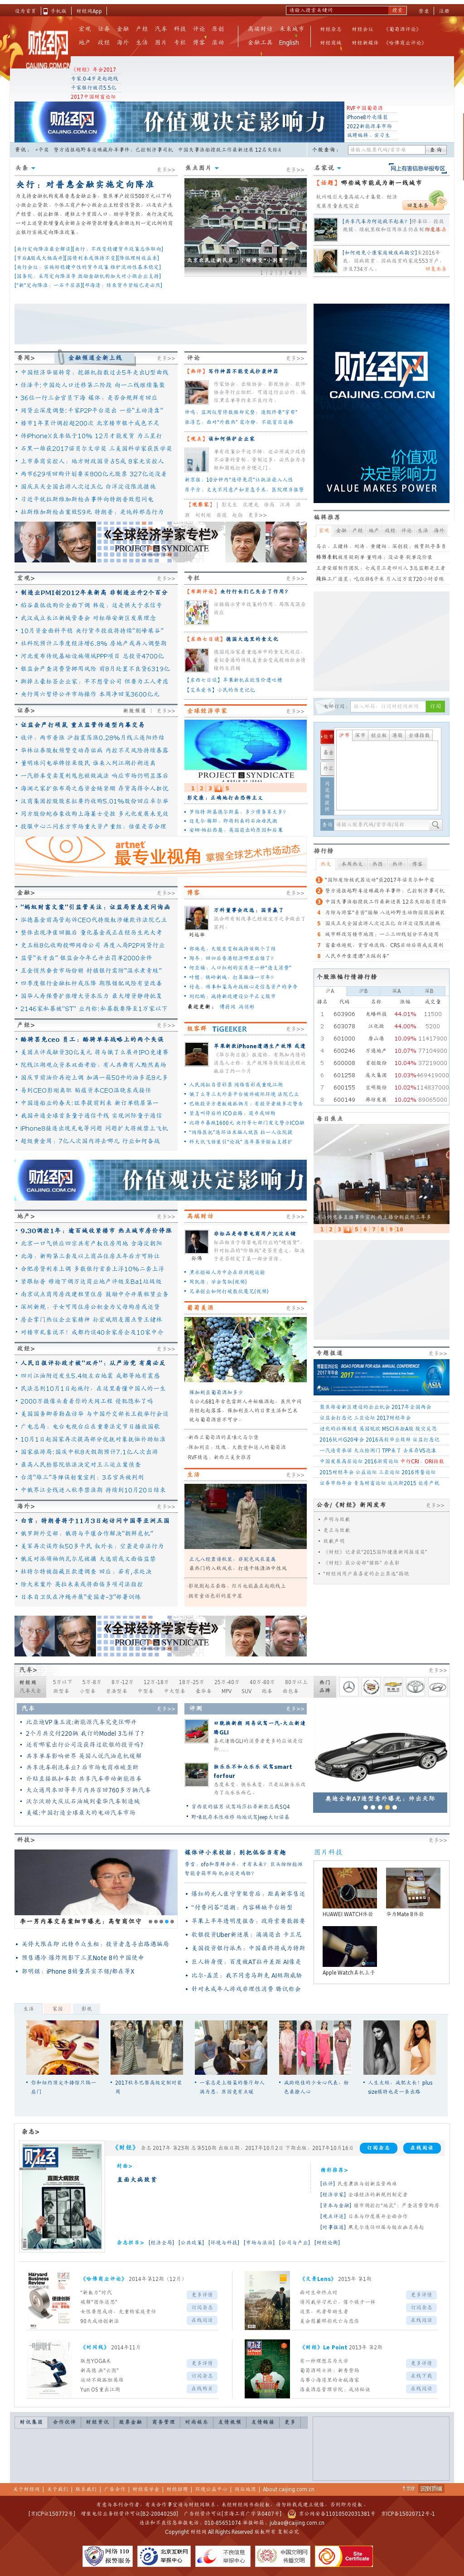 Caijing at Saturday Oct. 7, 2017, midnight UTC